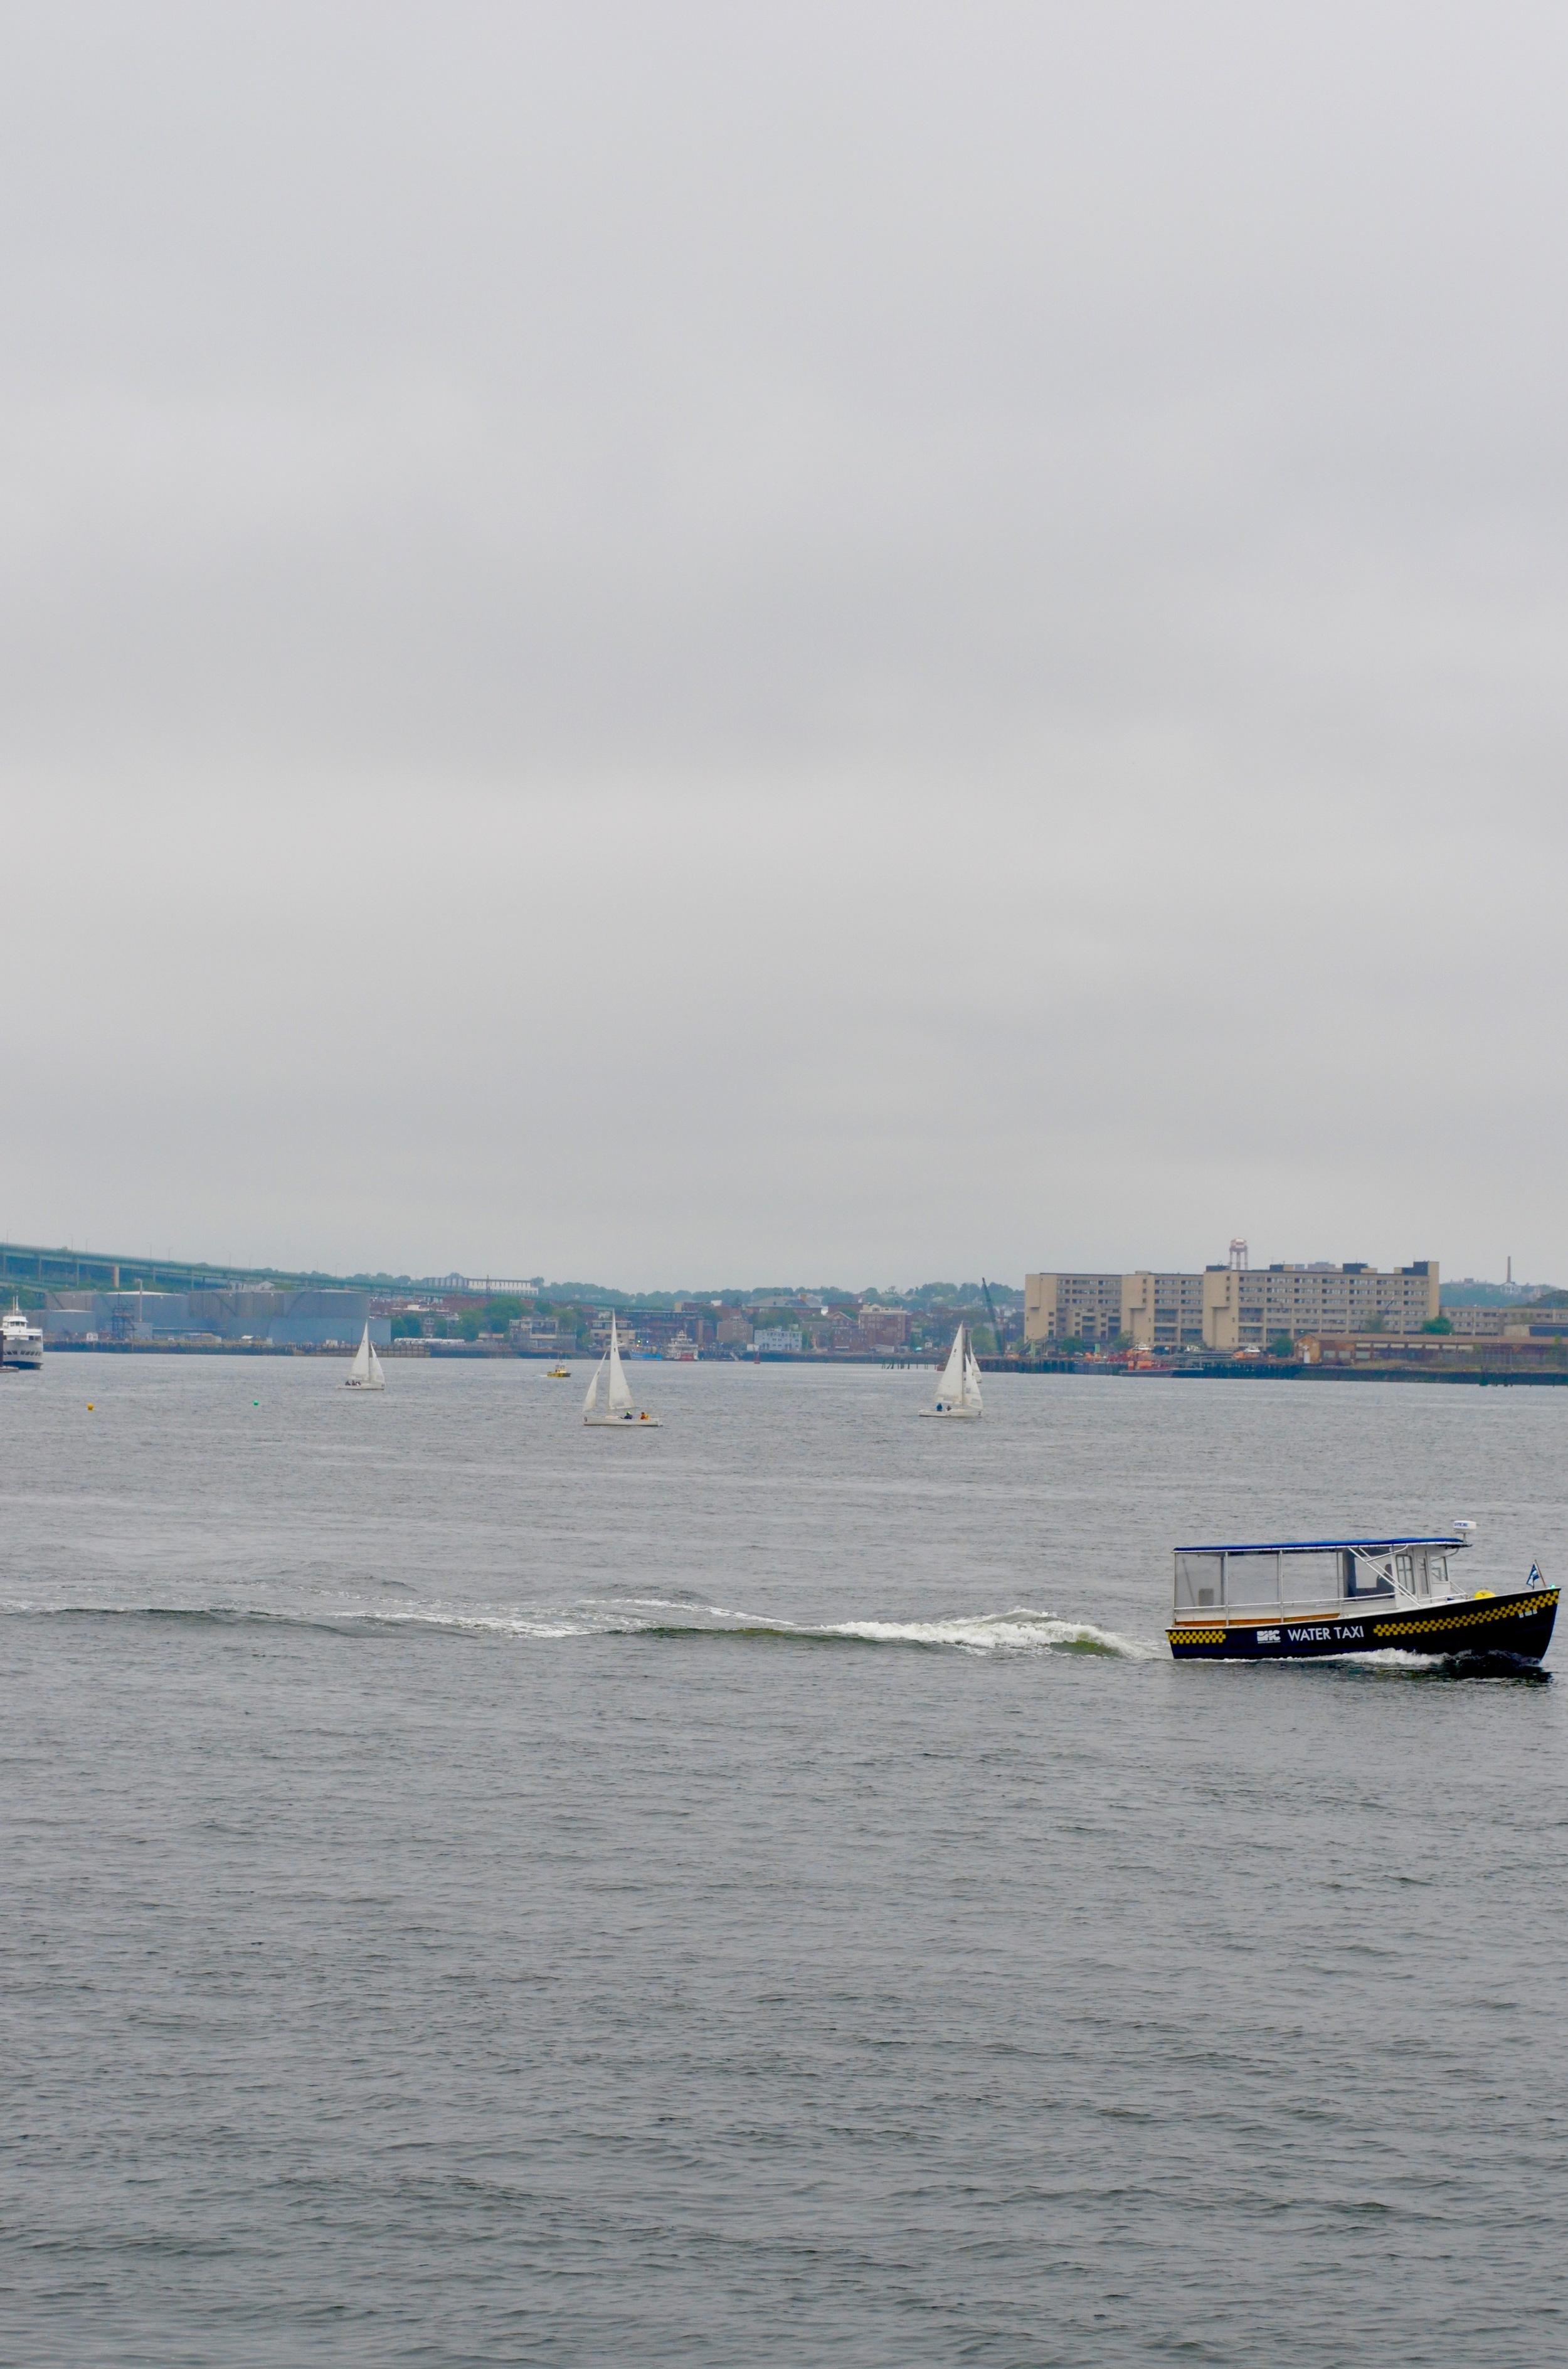 BostonHarbor.jpg